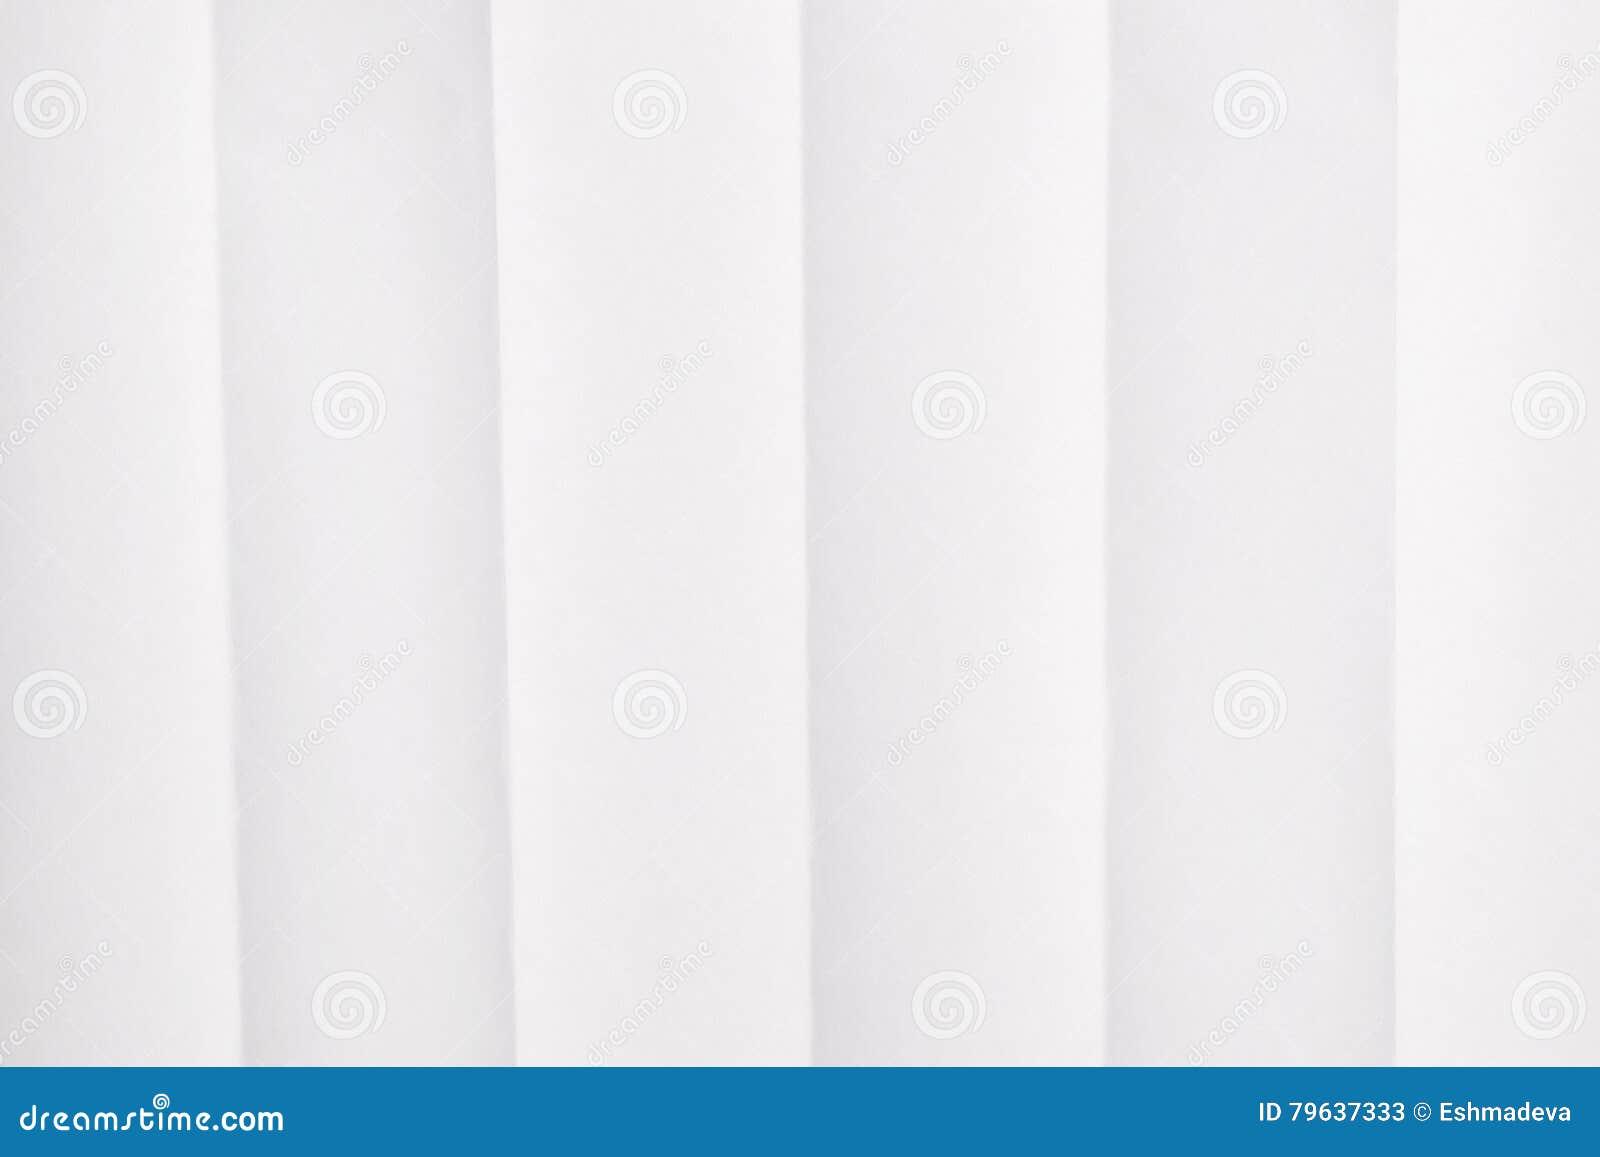 folded paper background stock image. image of blank, closeup - 79637333